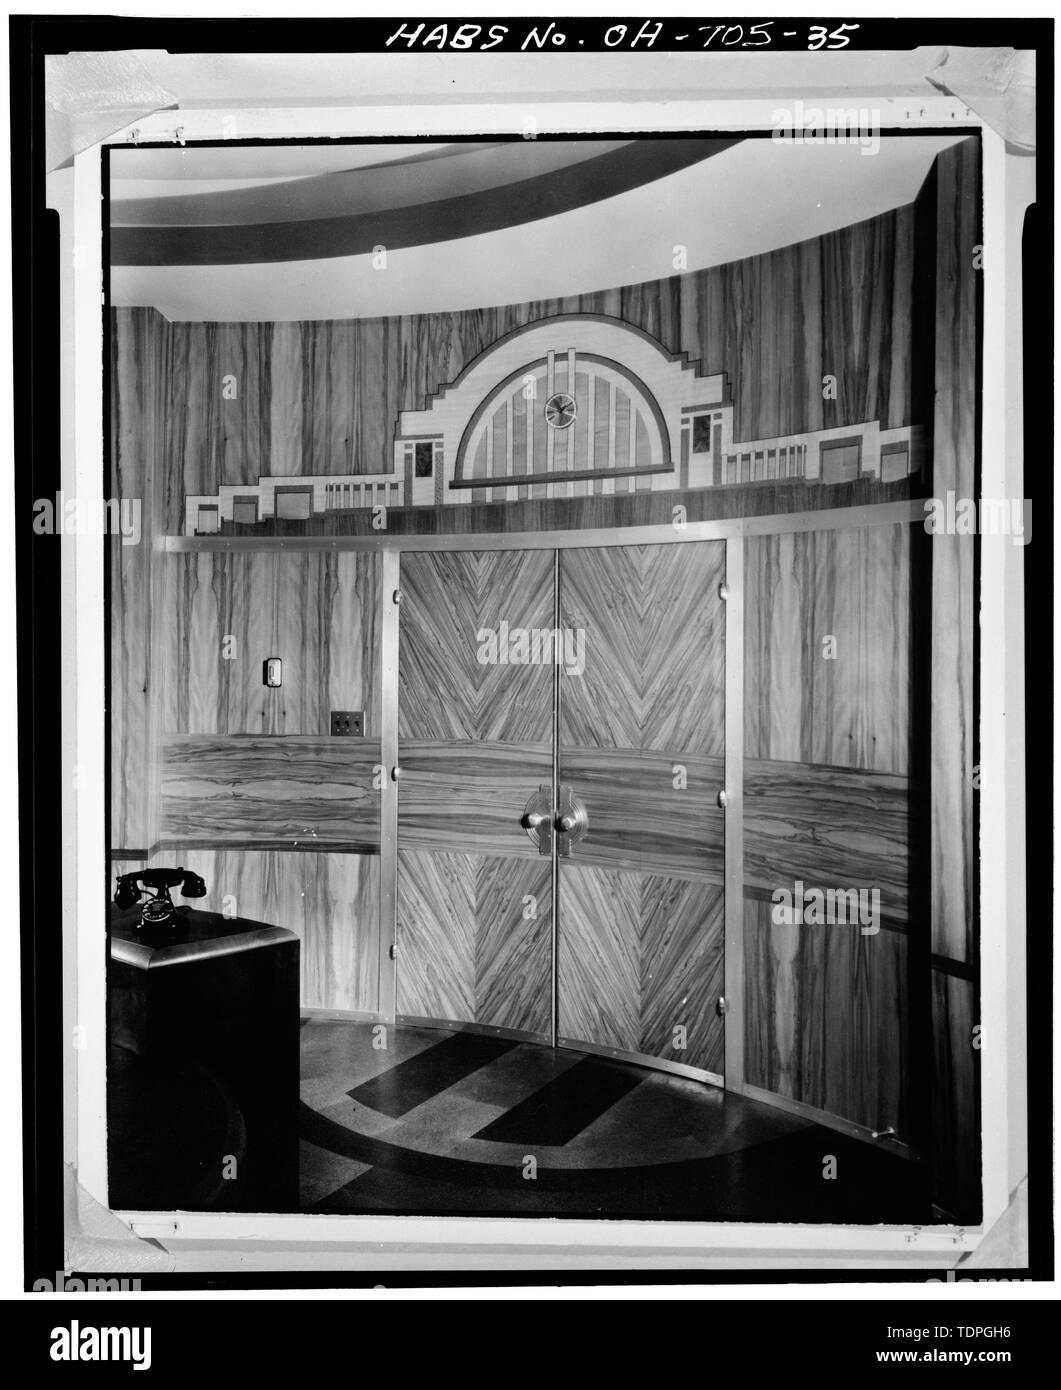 BOARD CHAIRMAN'S OFFICE, LOOKING SOUTH - Cincinnati Union Terminal, 1301 Western Avenue, Cincinnati, Hamilton County, OH Stock Photo